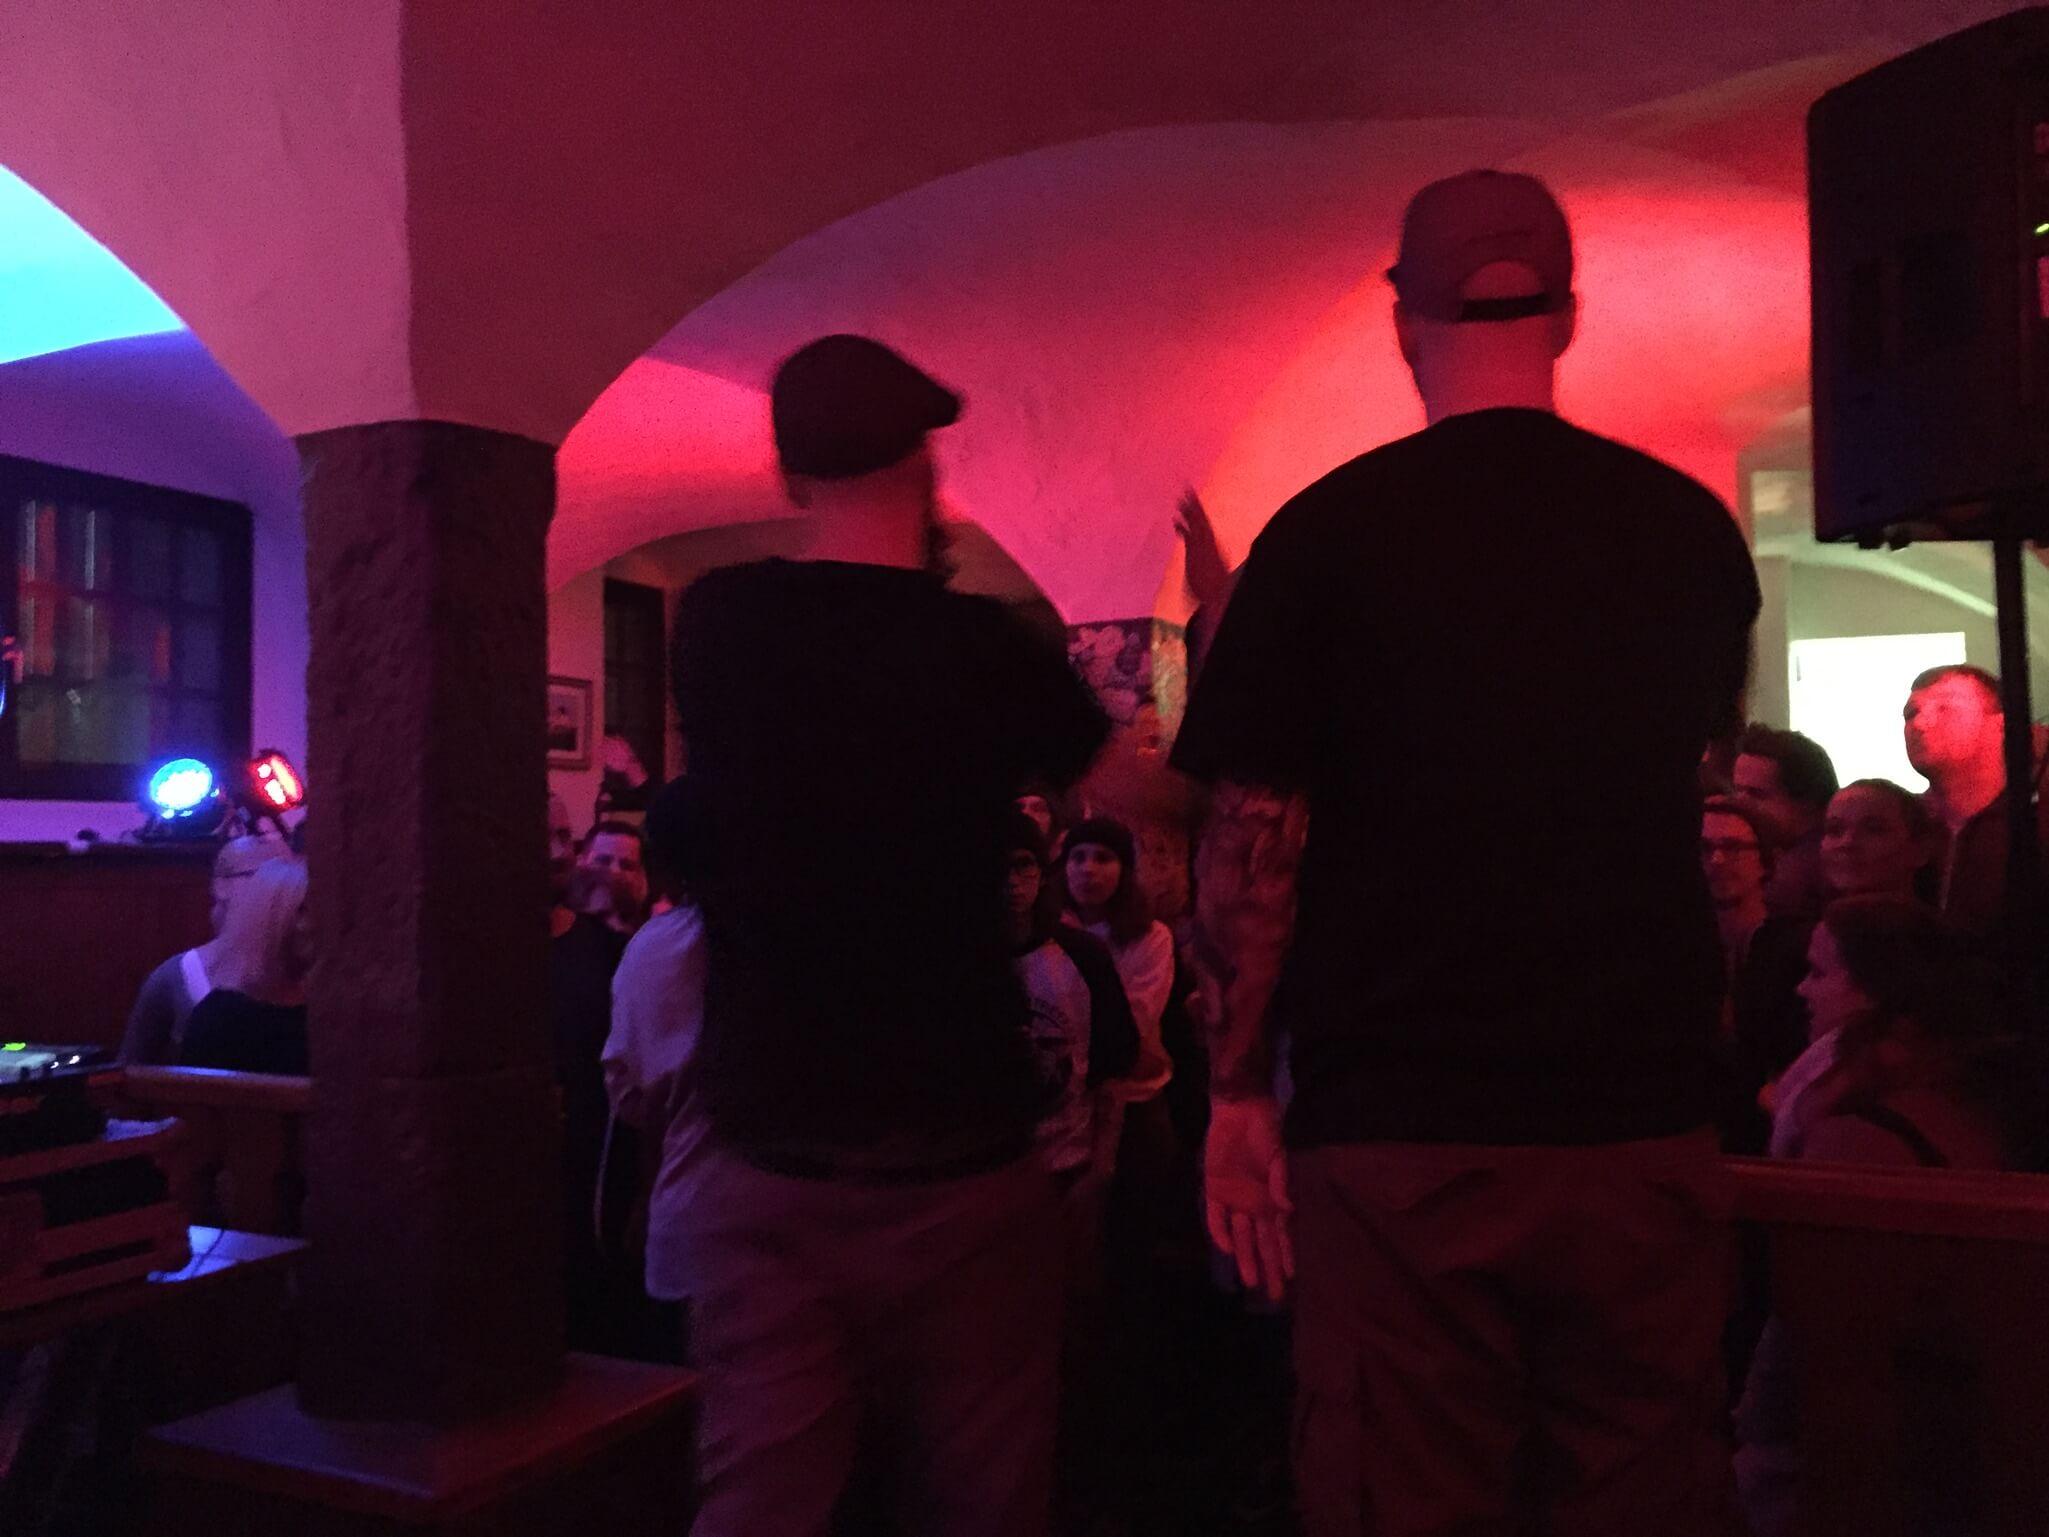 Cane und Heinz. Company Slow. Frankenburger. Live Hip Hop. Bratwurst Rap. Coburg.